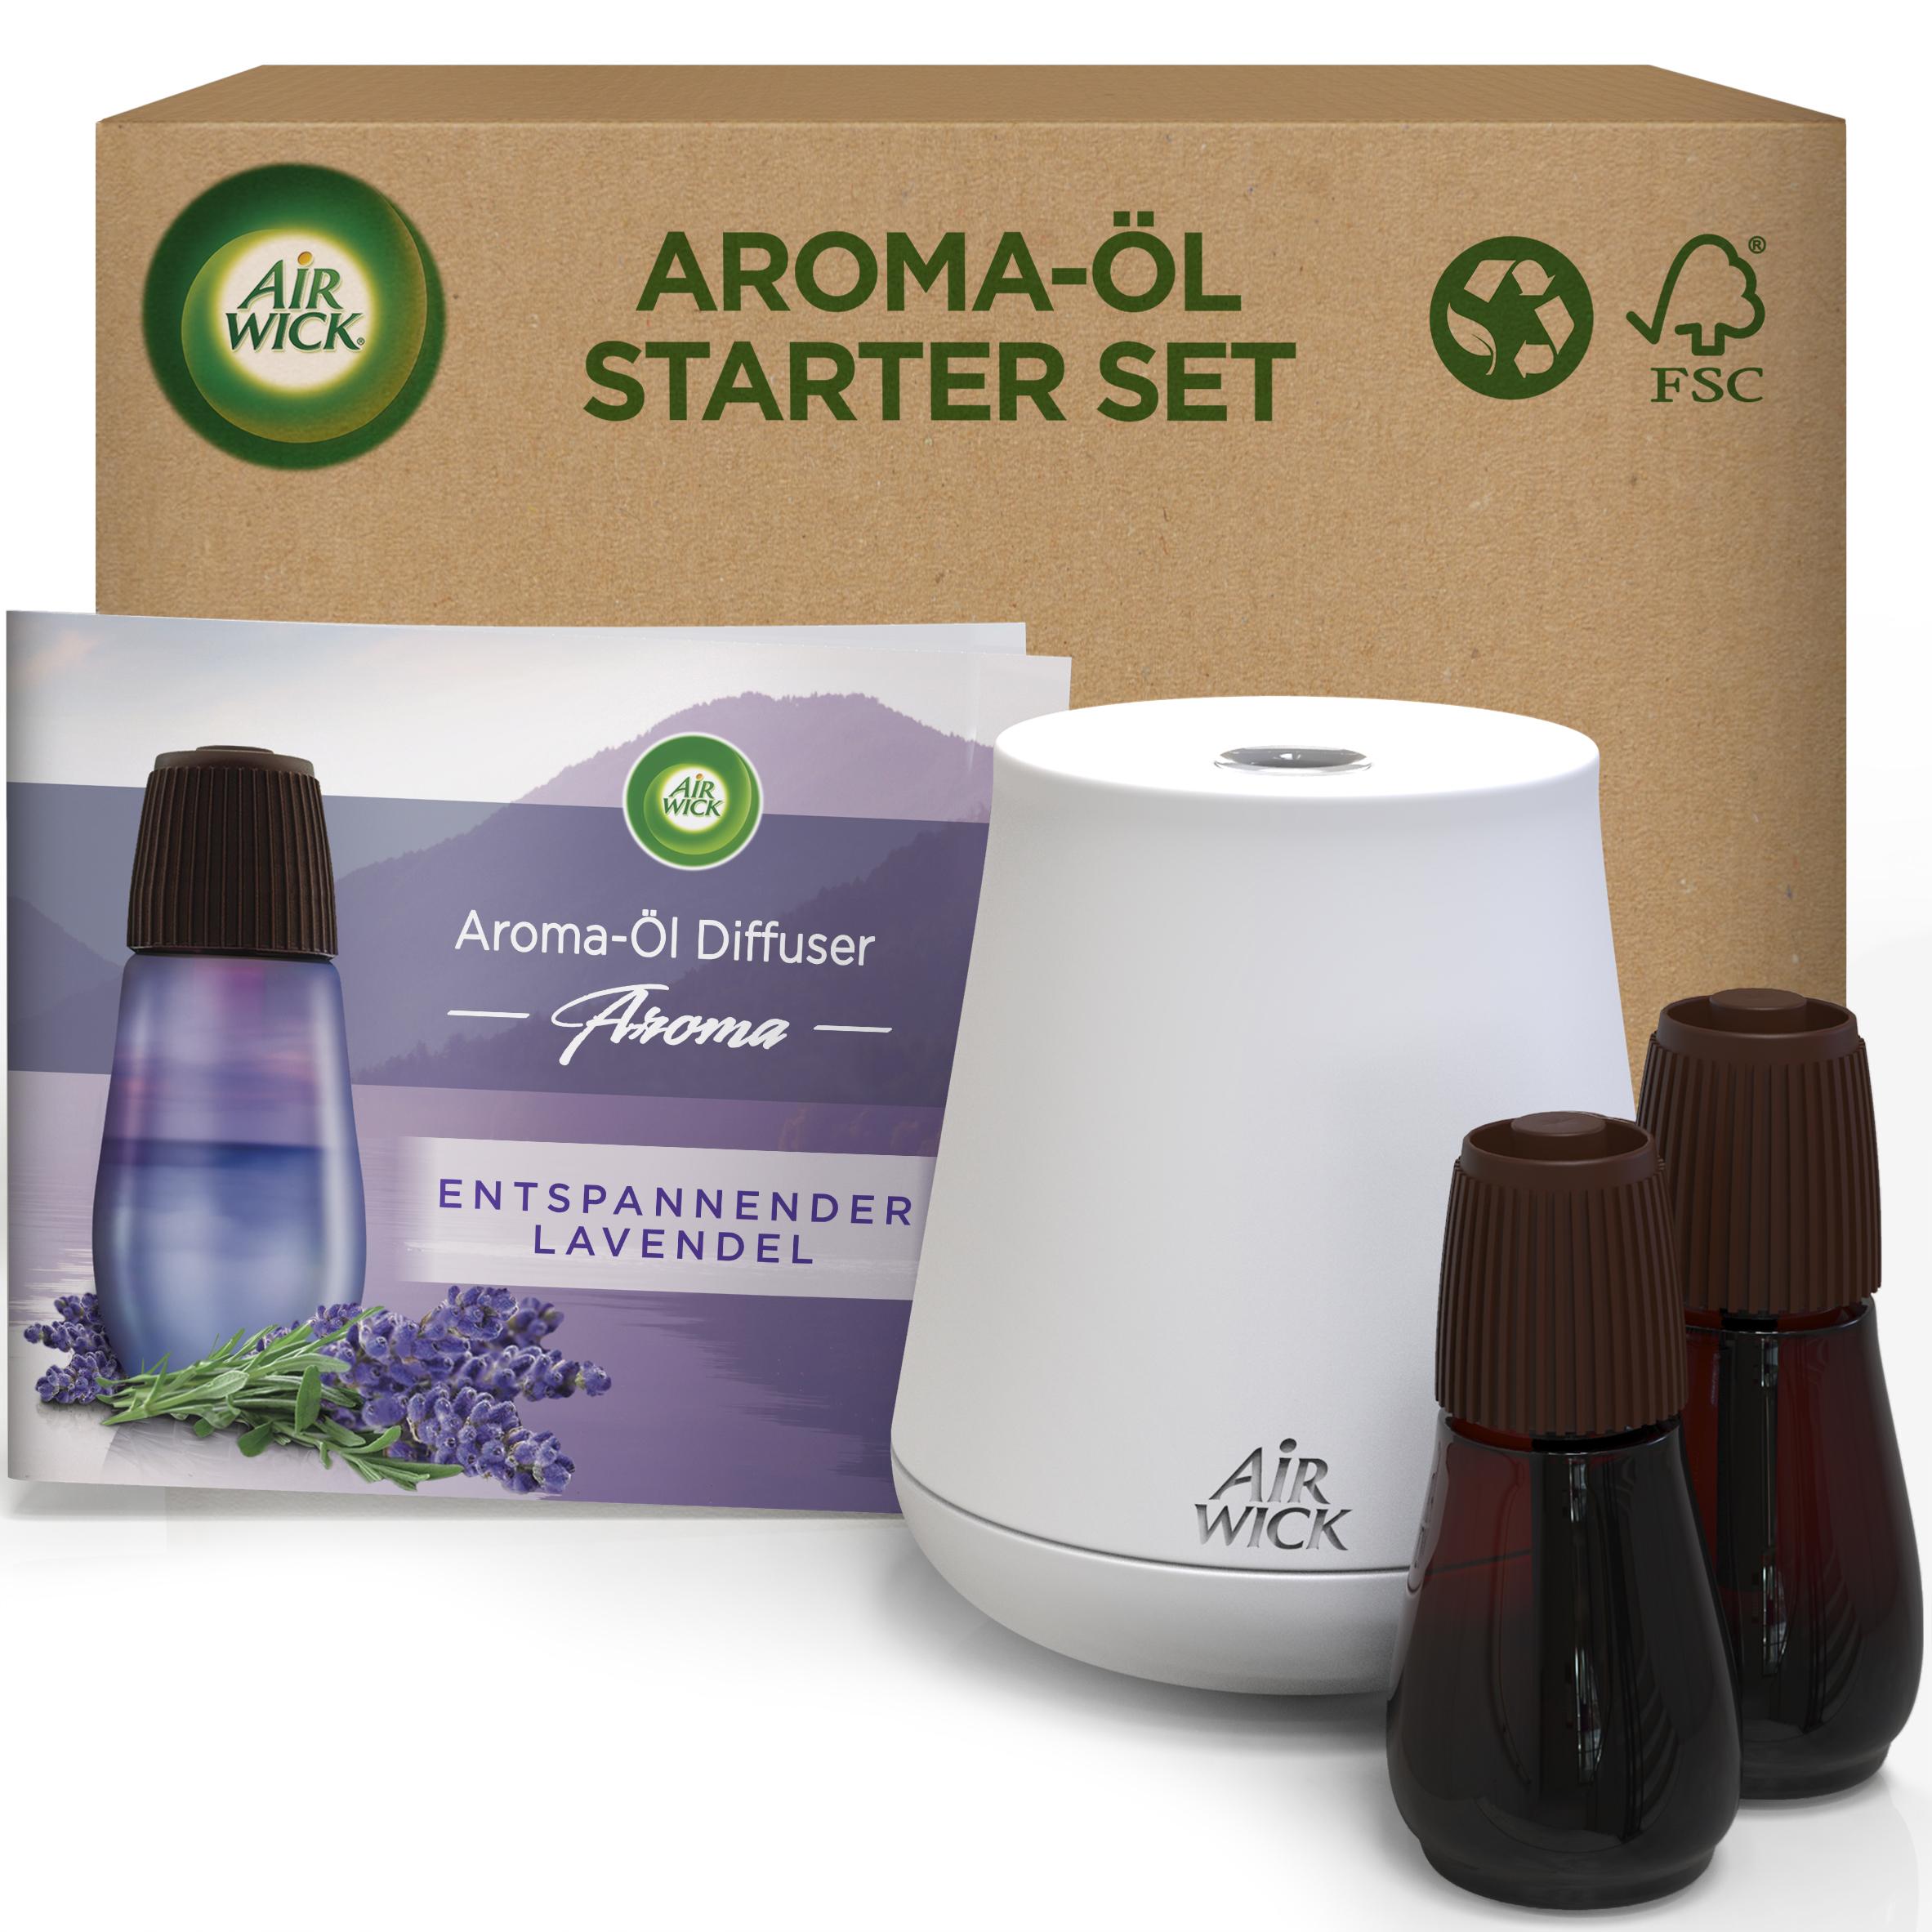 Air Wick Aroma-Öl Diffuser eCom Starter-Set Entspannender Lavendel